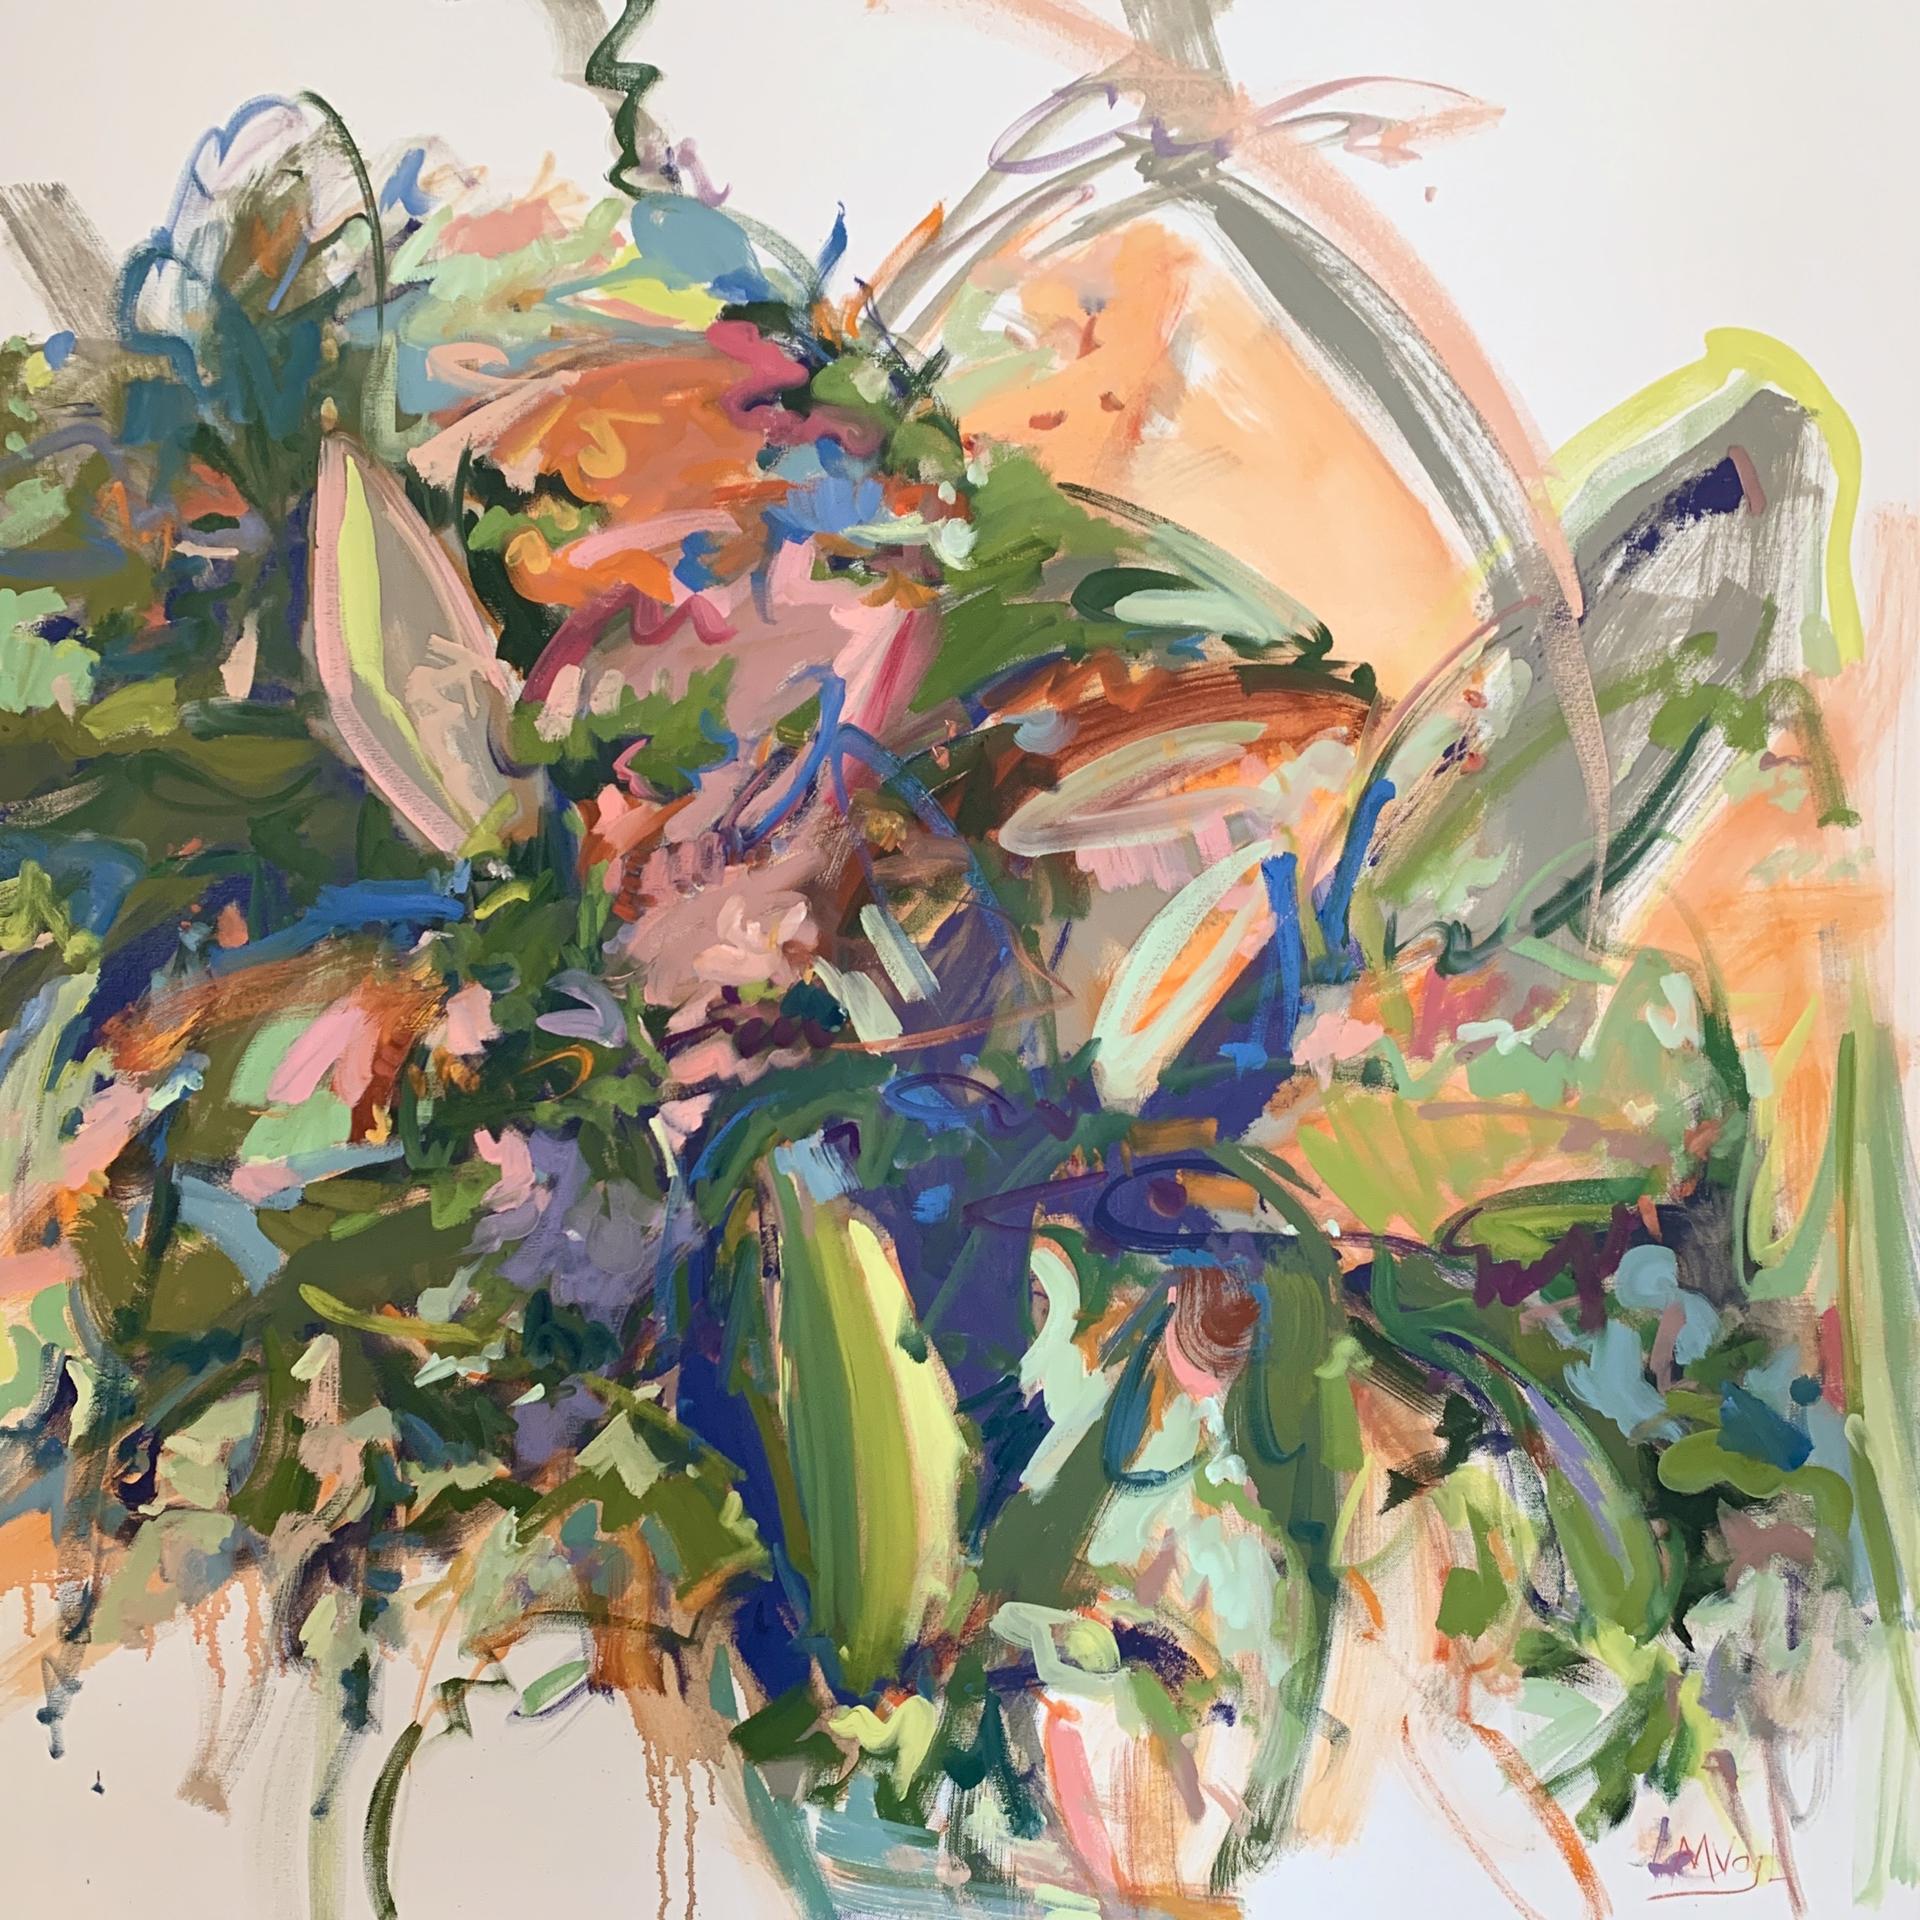 Excite Me, Delight Me by Marissa Vogl